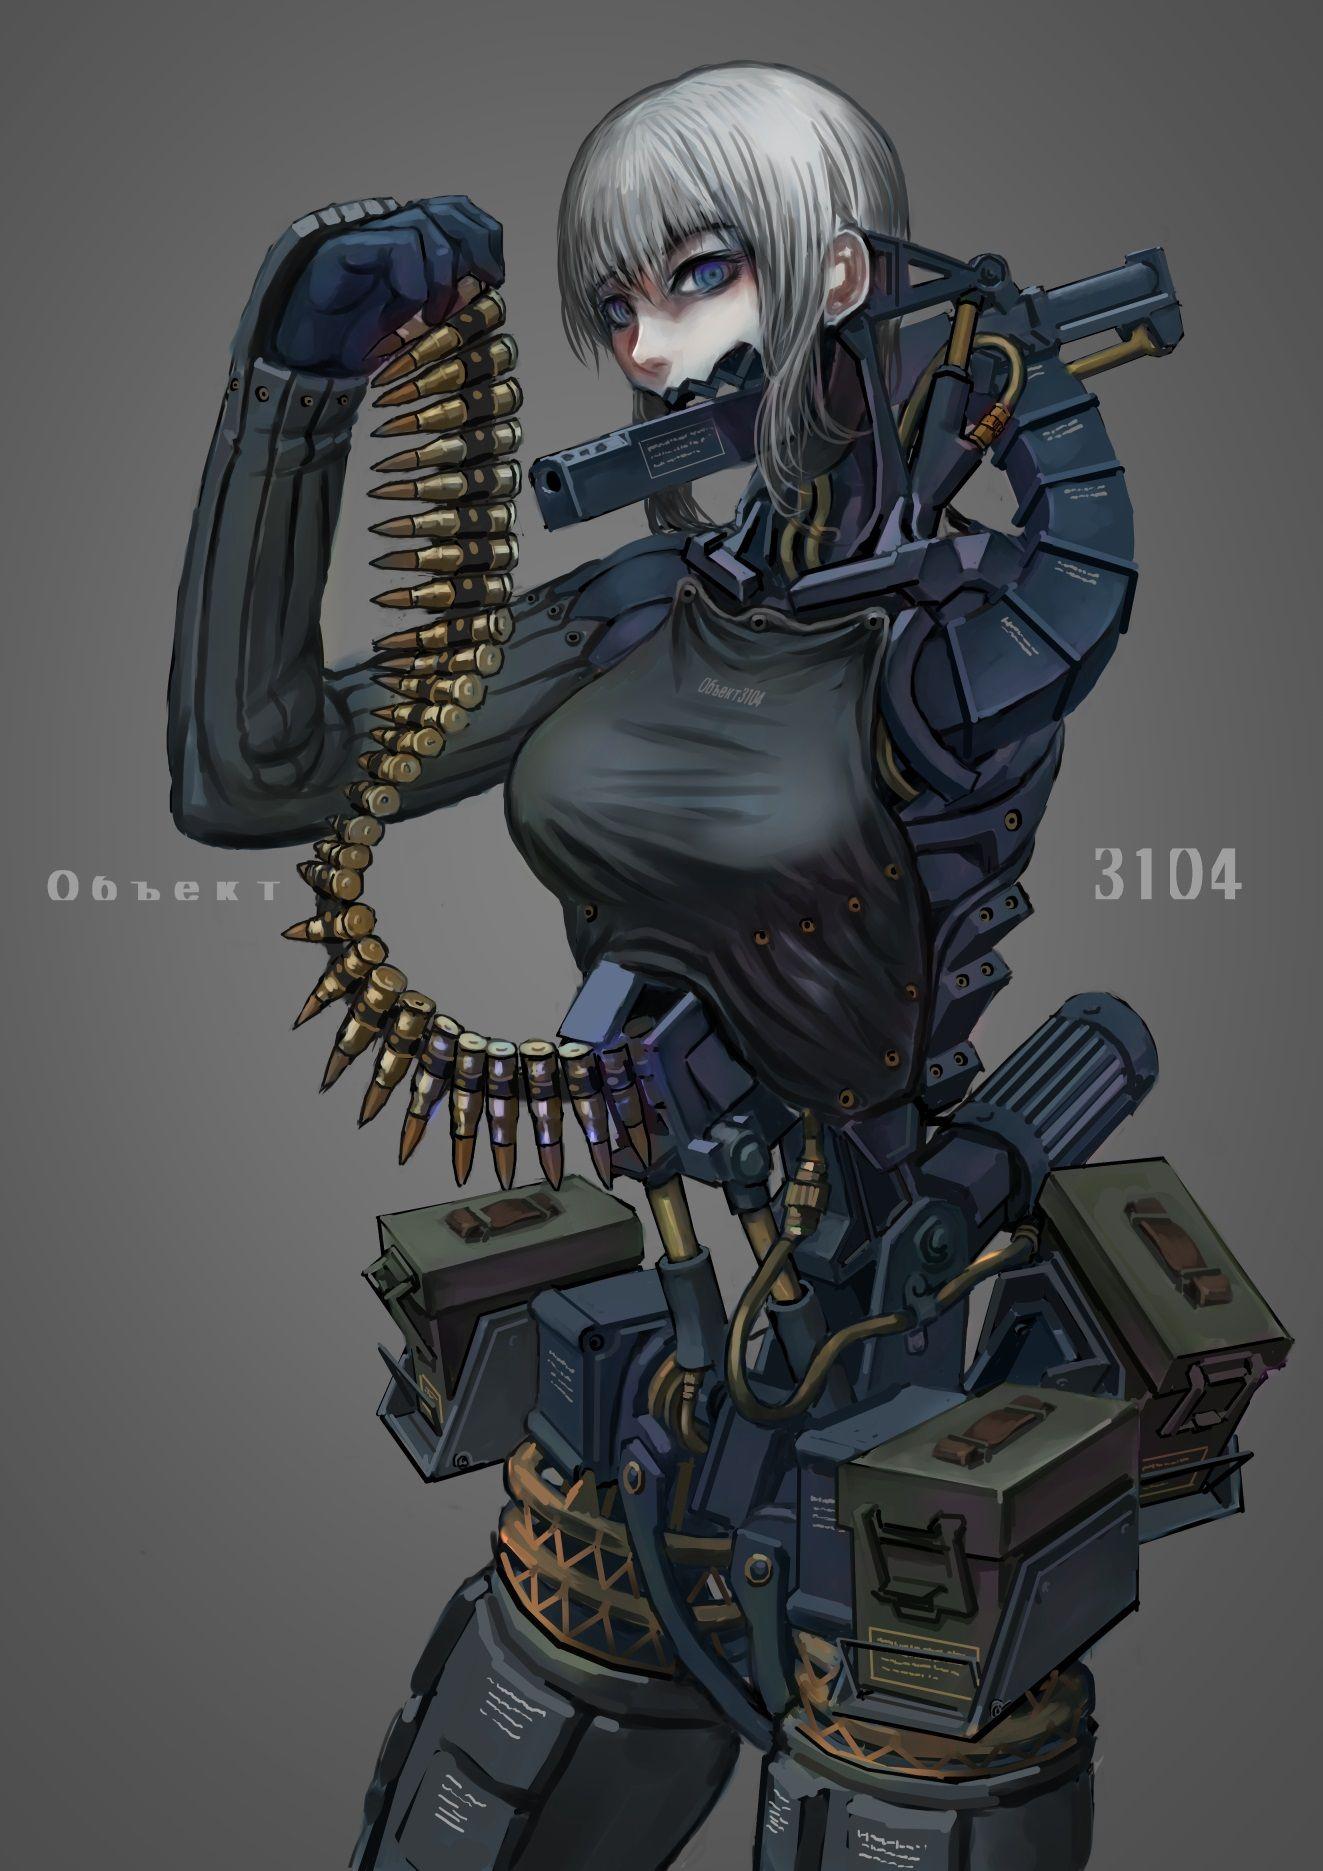 Pin by Roman Orsborn on NINE art, Female robot